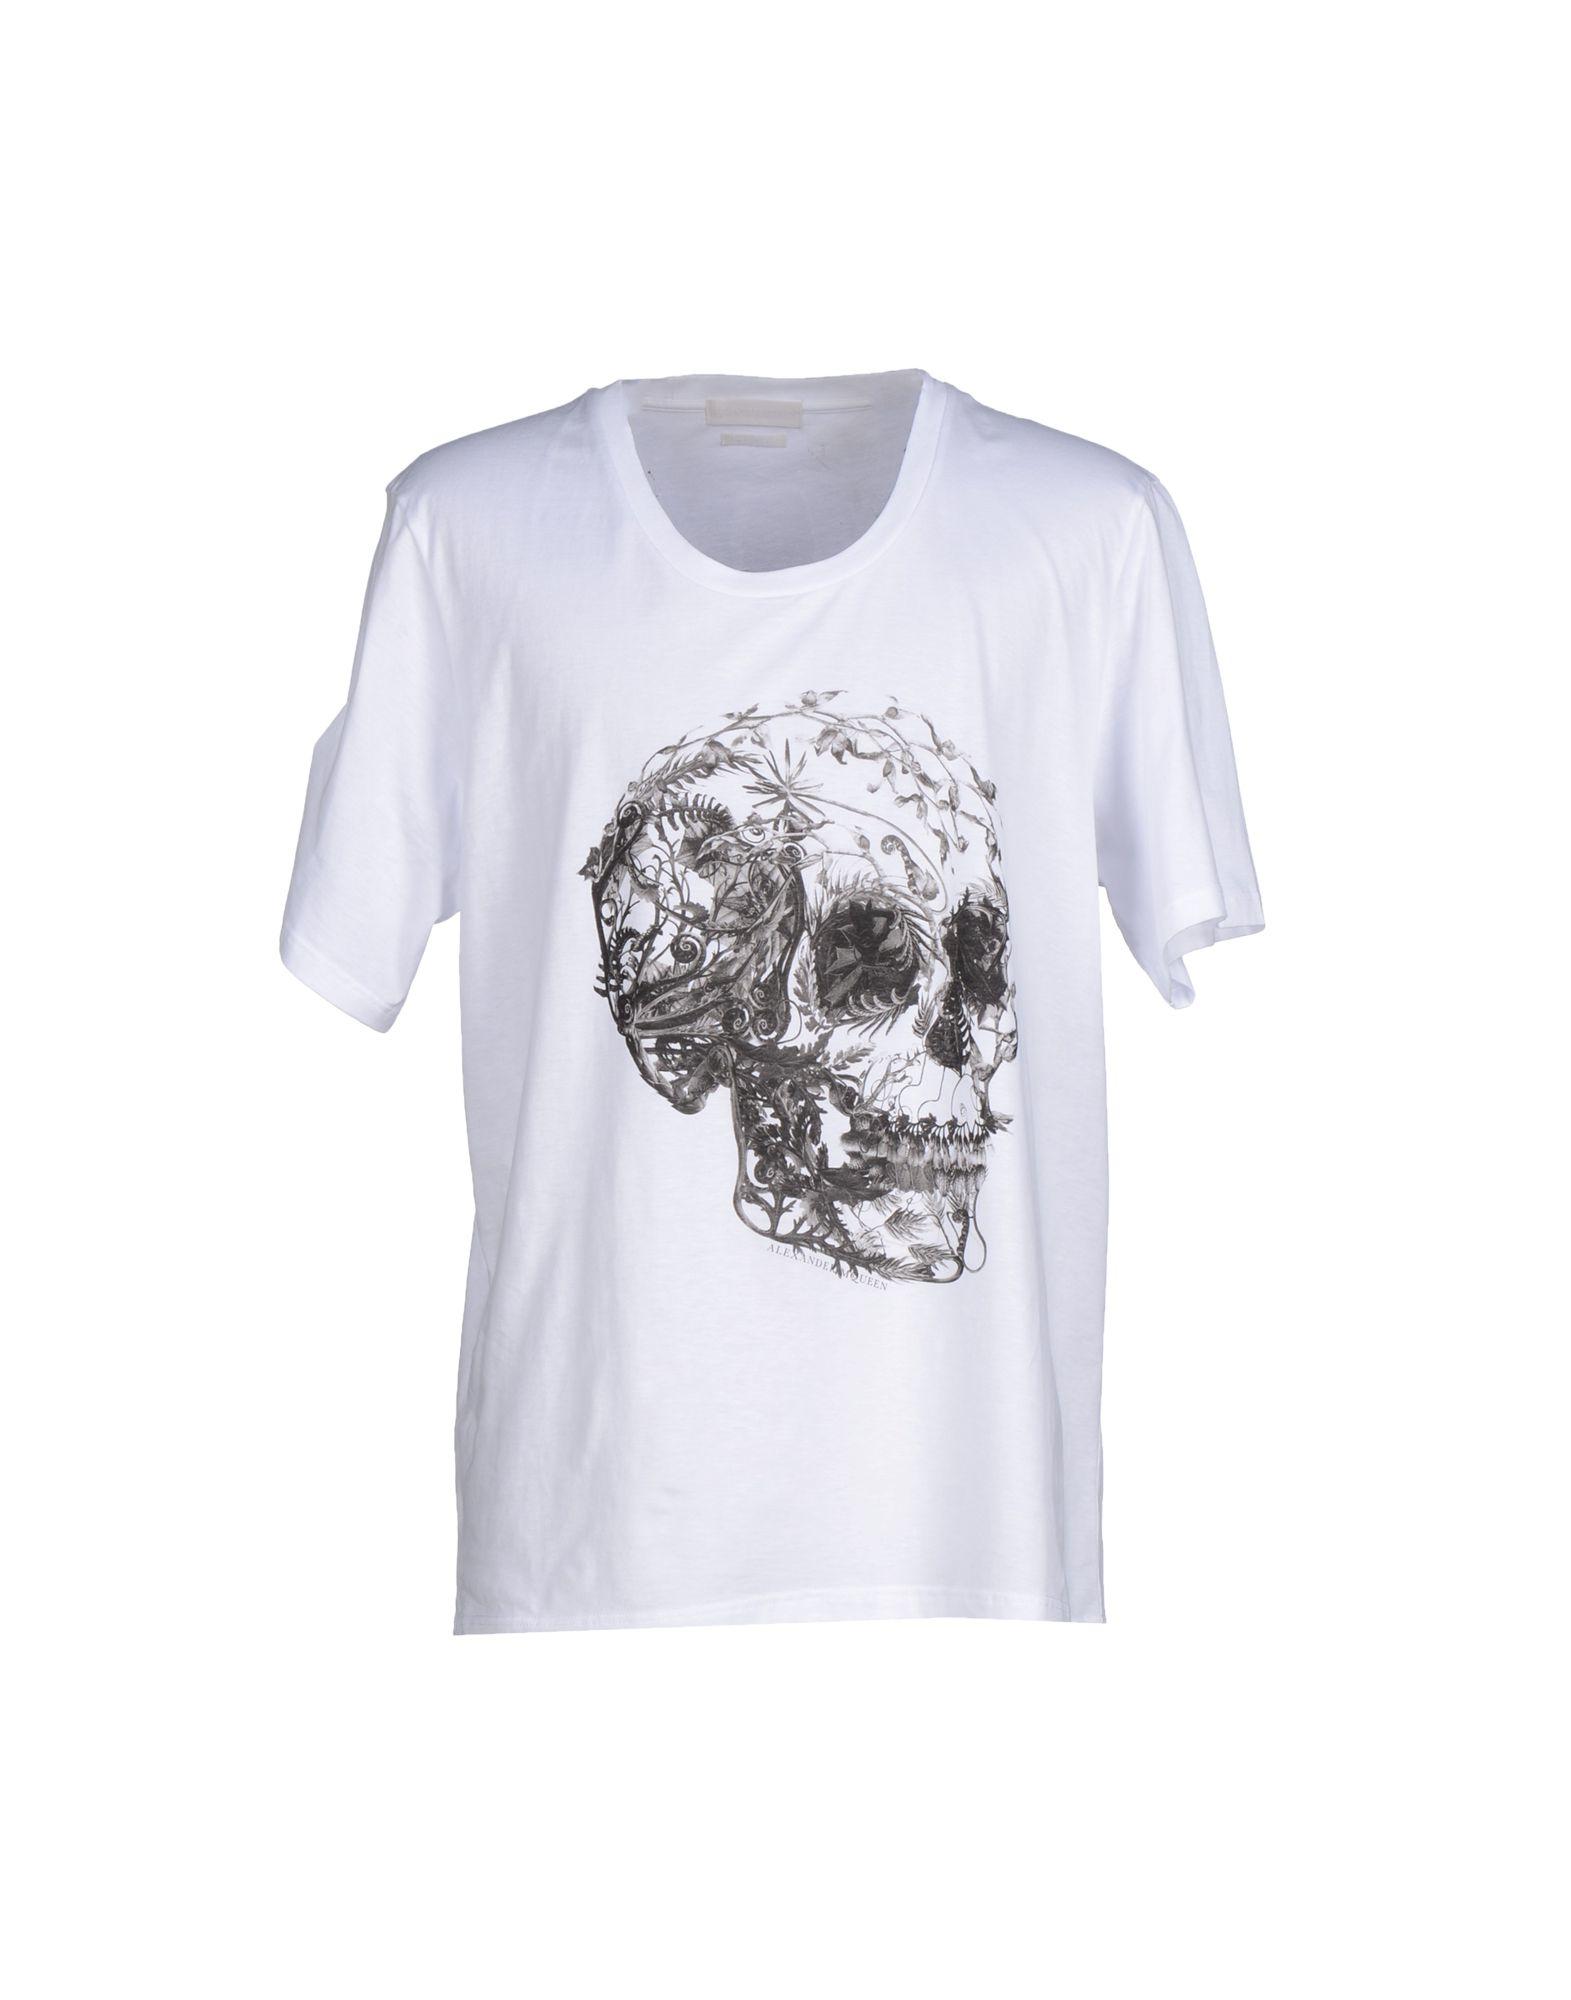 Lyst alexander mcqueen t shirt in white for men for Alexander mcqueen shirt men